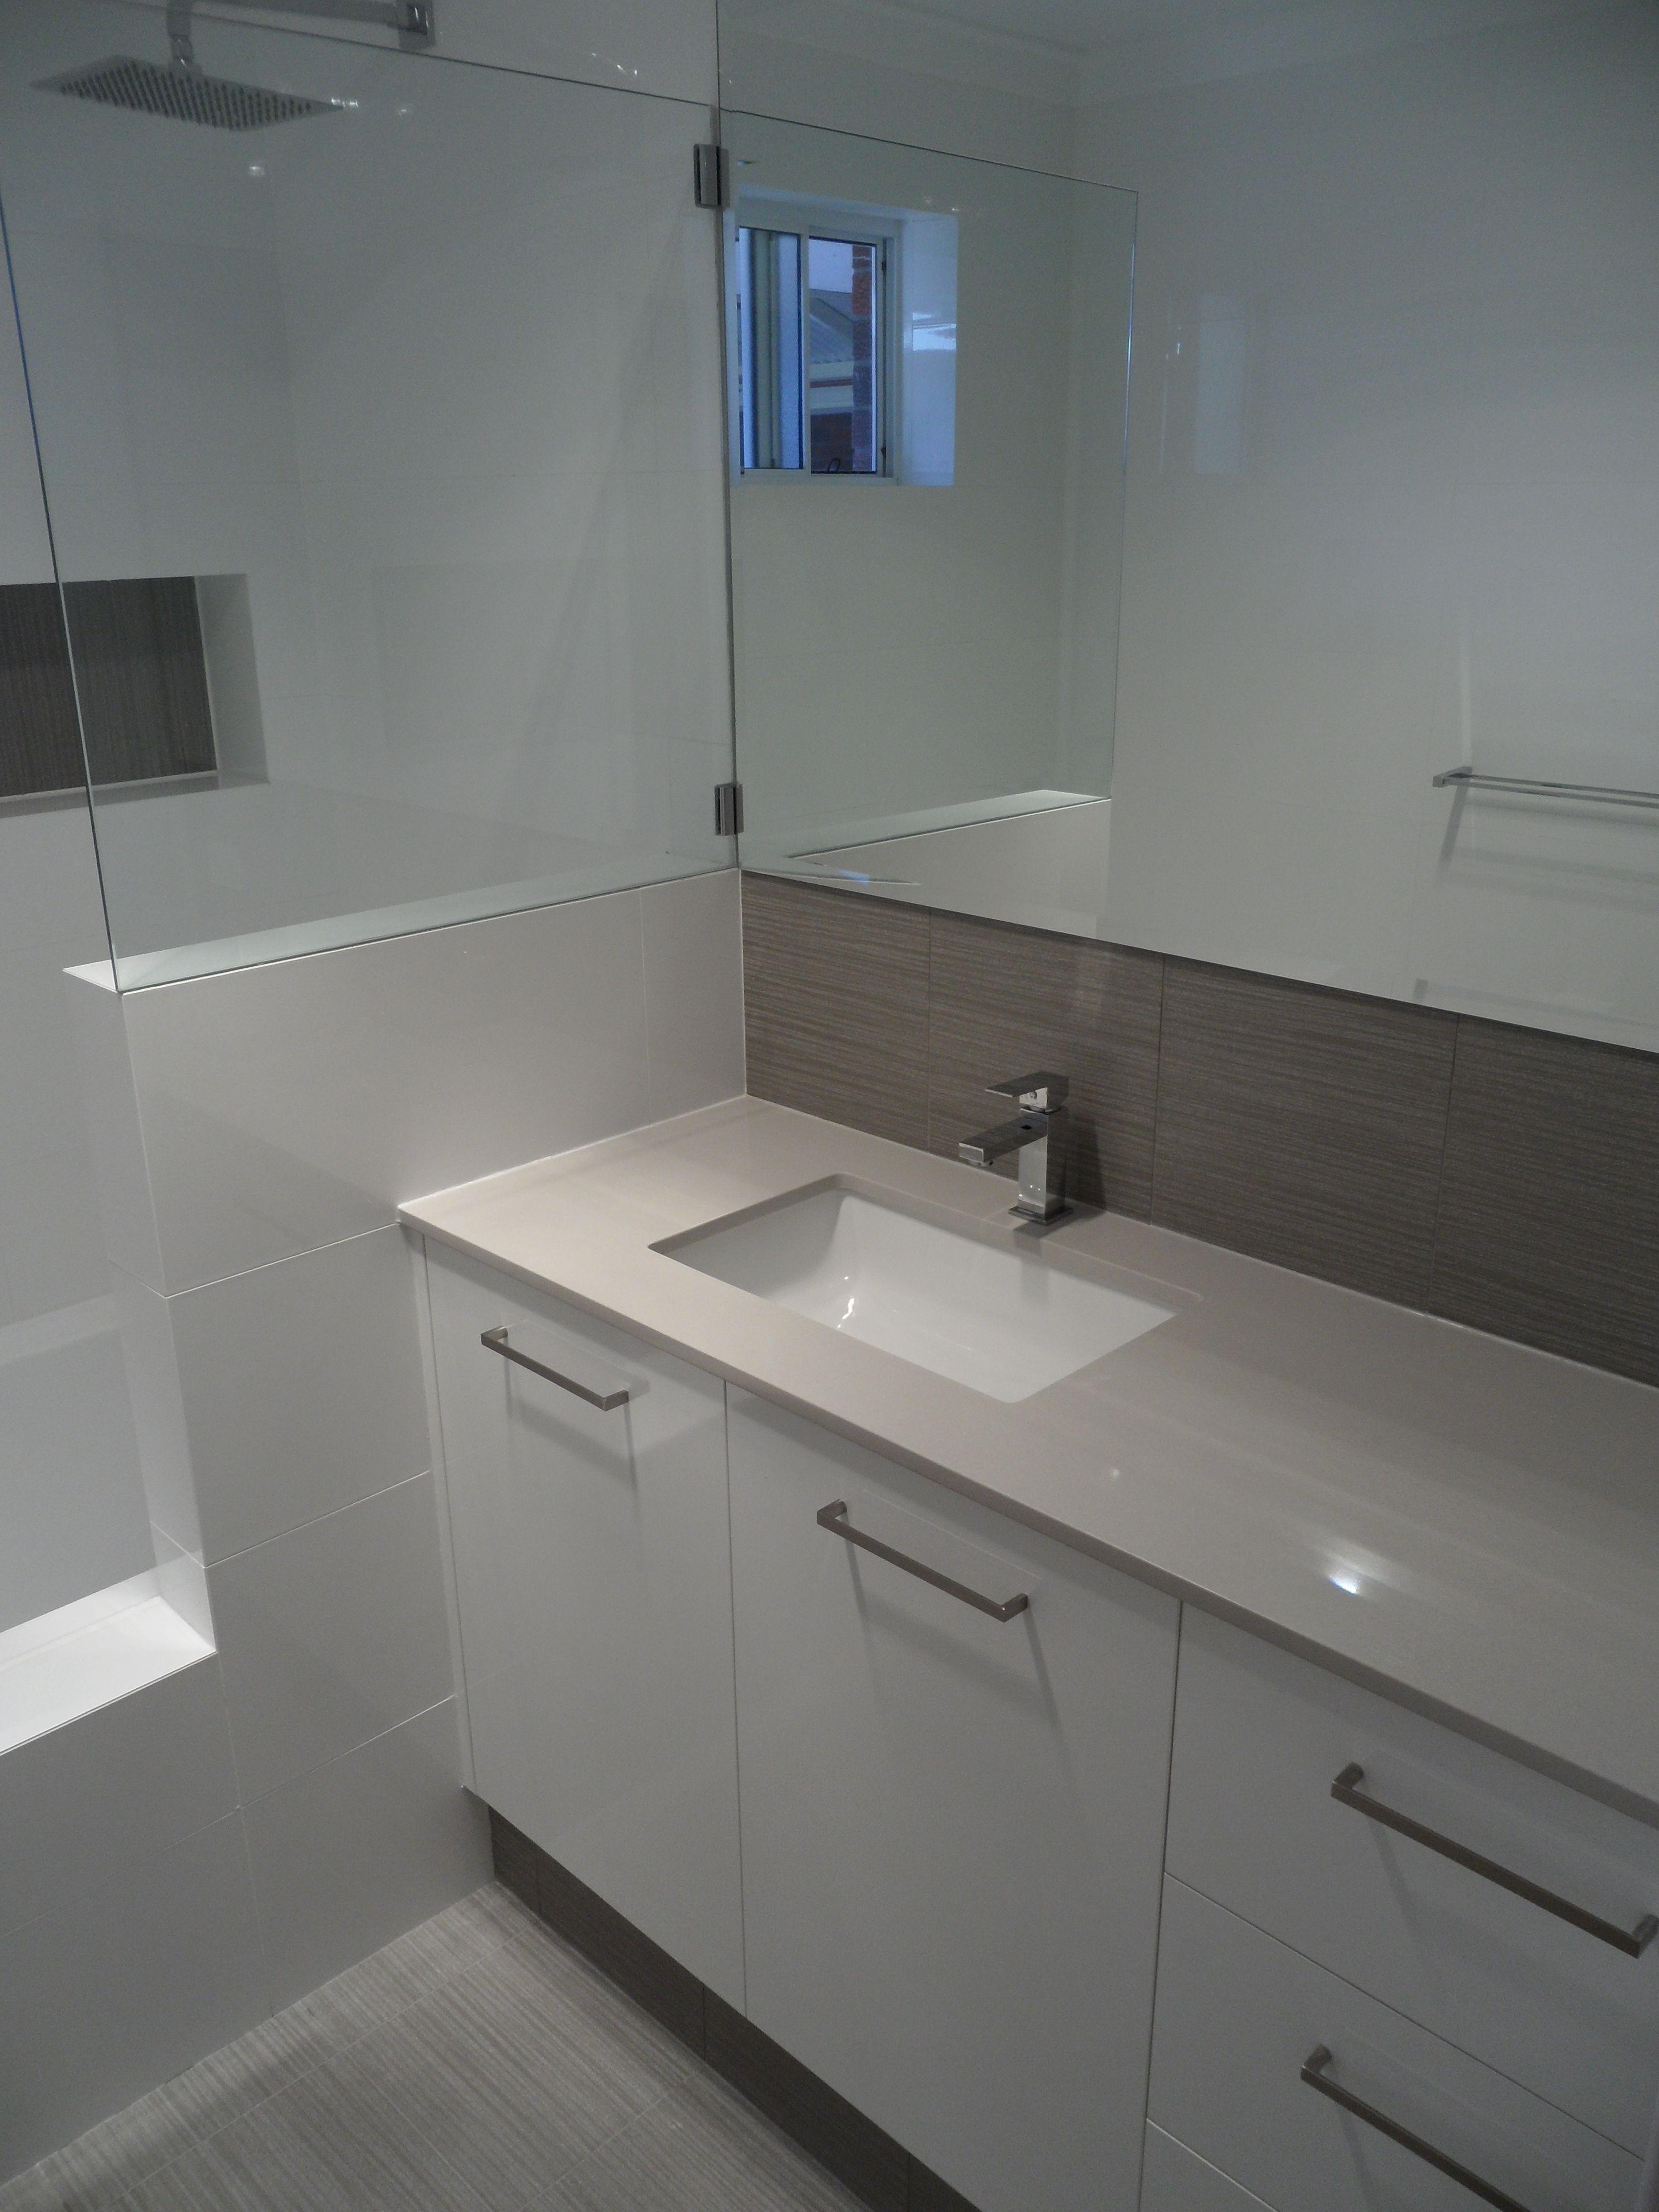 Best Undermount Bathroom Sink Design Ideas Remodel: Hillary's Bathroom Renovation. New Layout, Custom Vanity